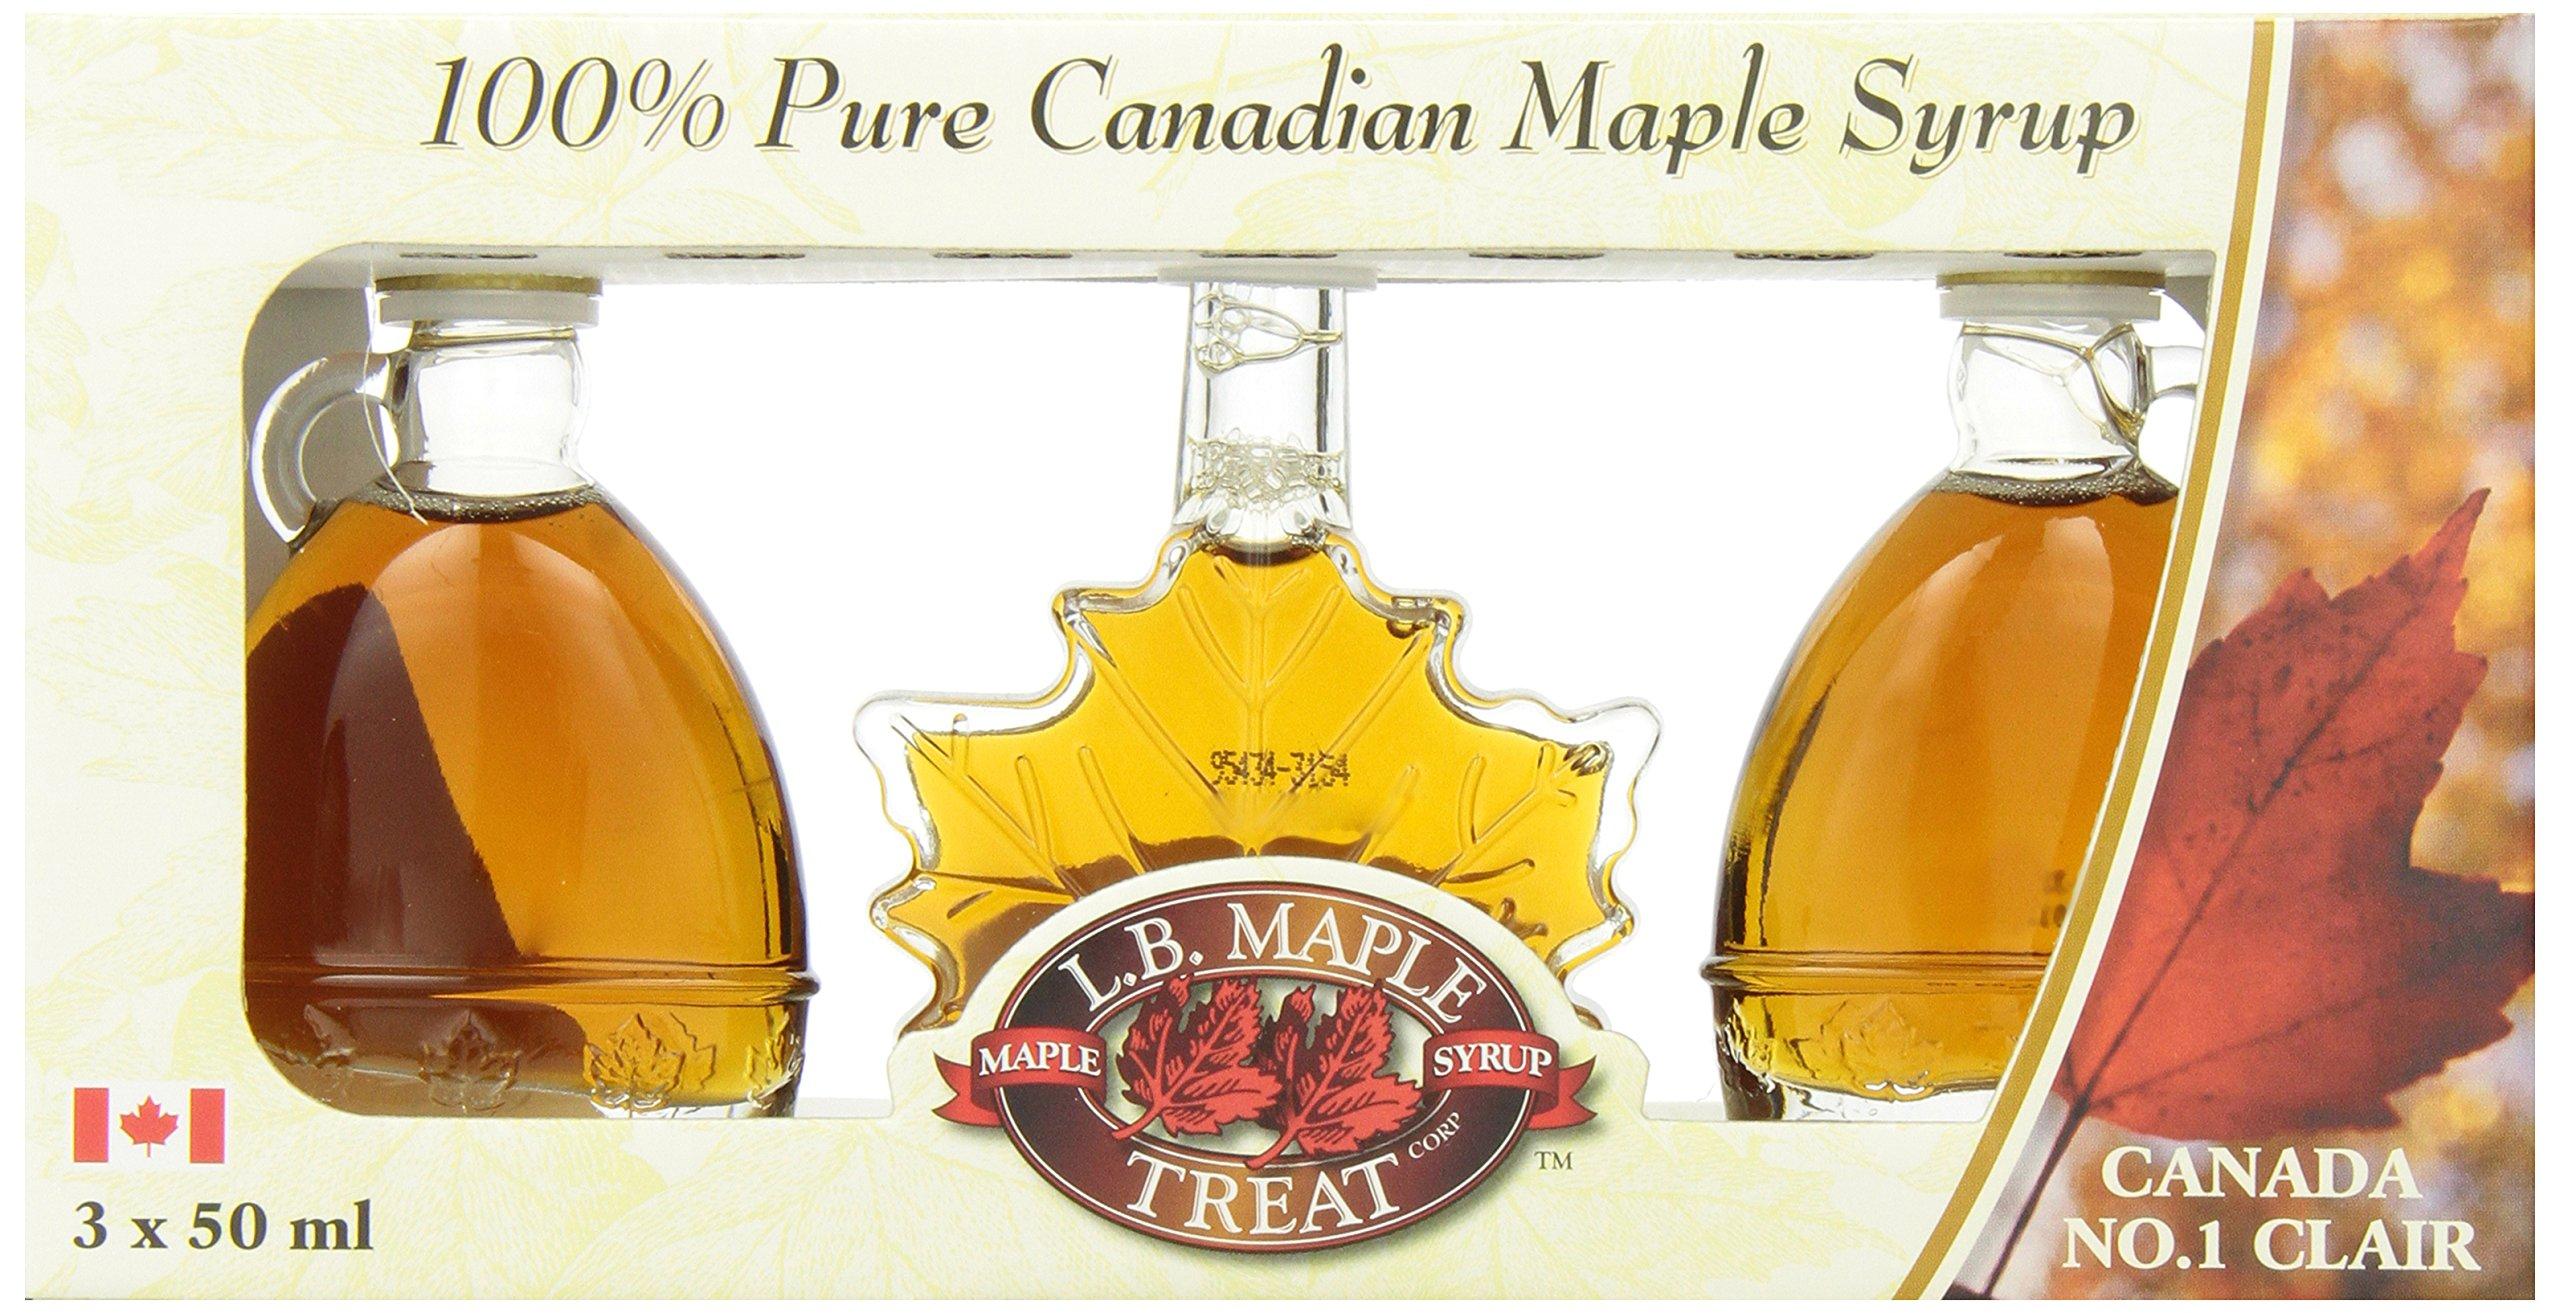 CDM product L B Maple Treat Maple Syrup in Fancy Glass Gift Box, 150ml/5.07fl oz big image